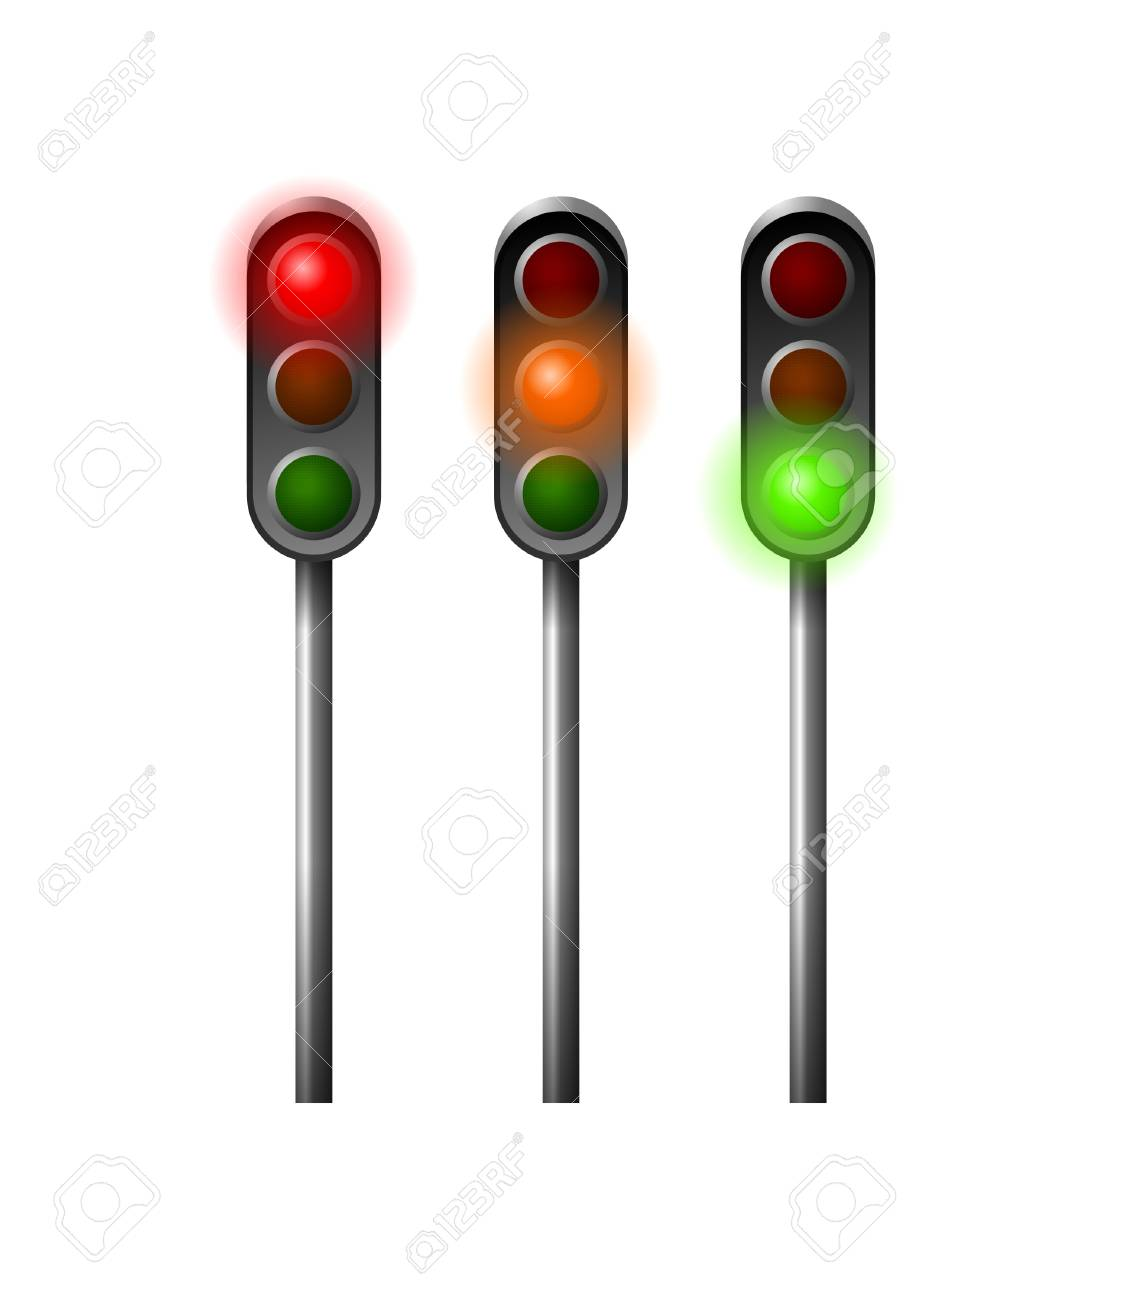 traffic lights Stock Photo - 17191404